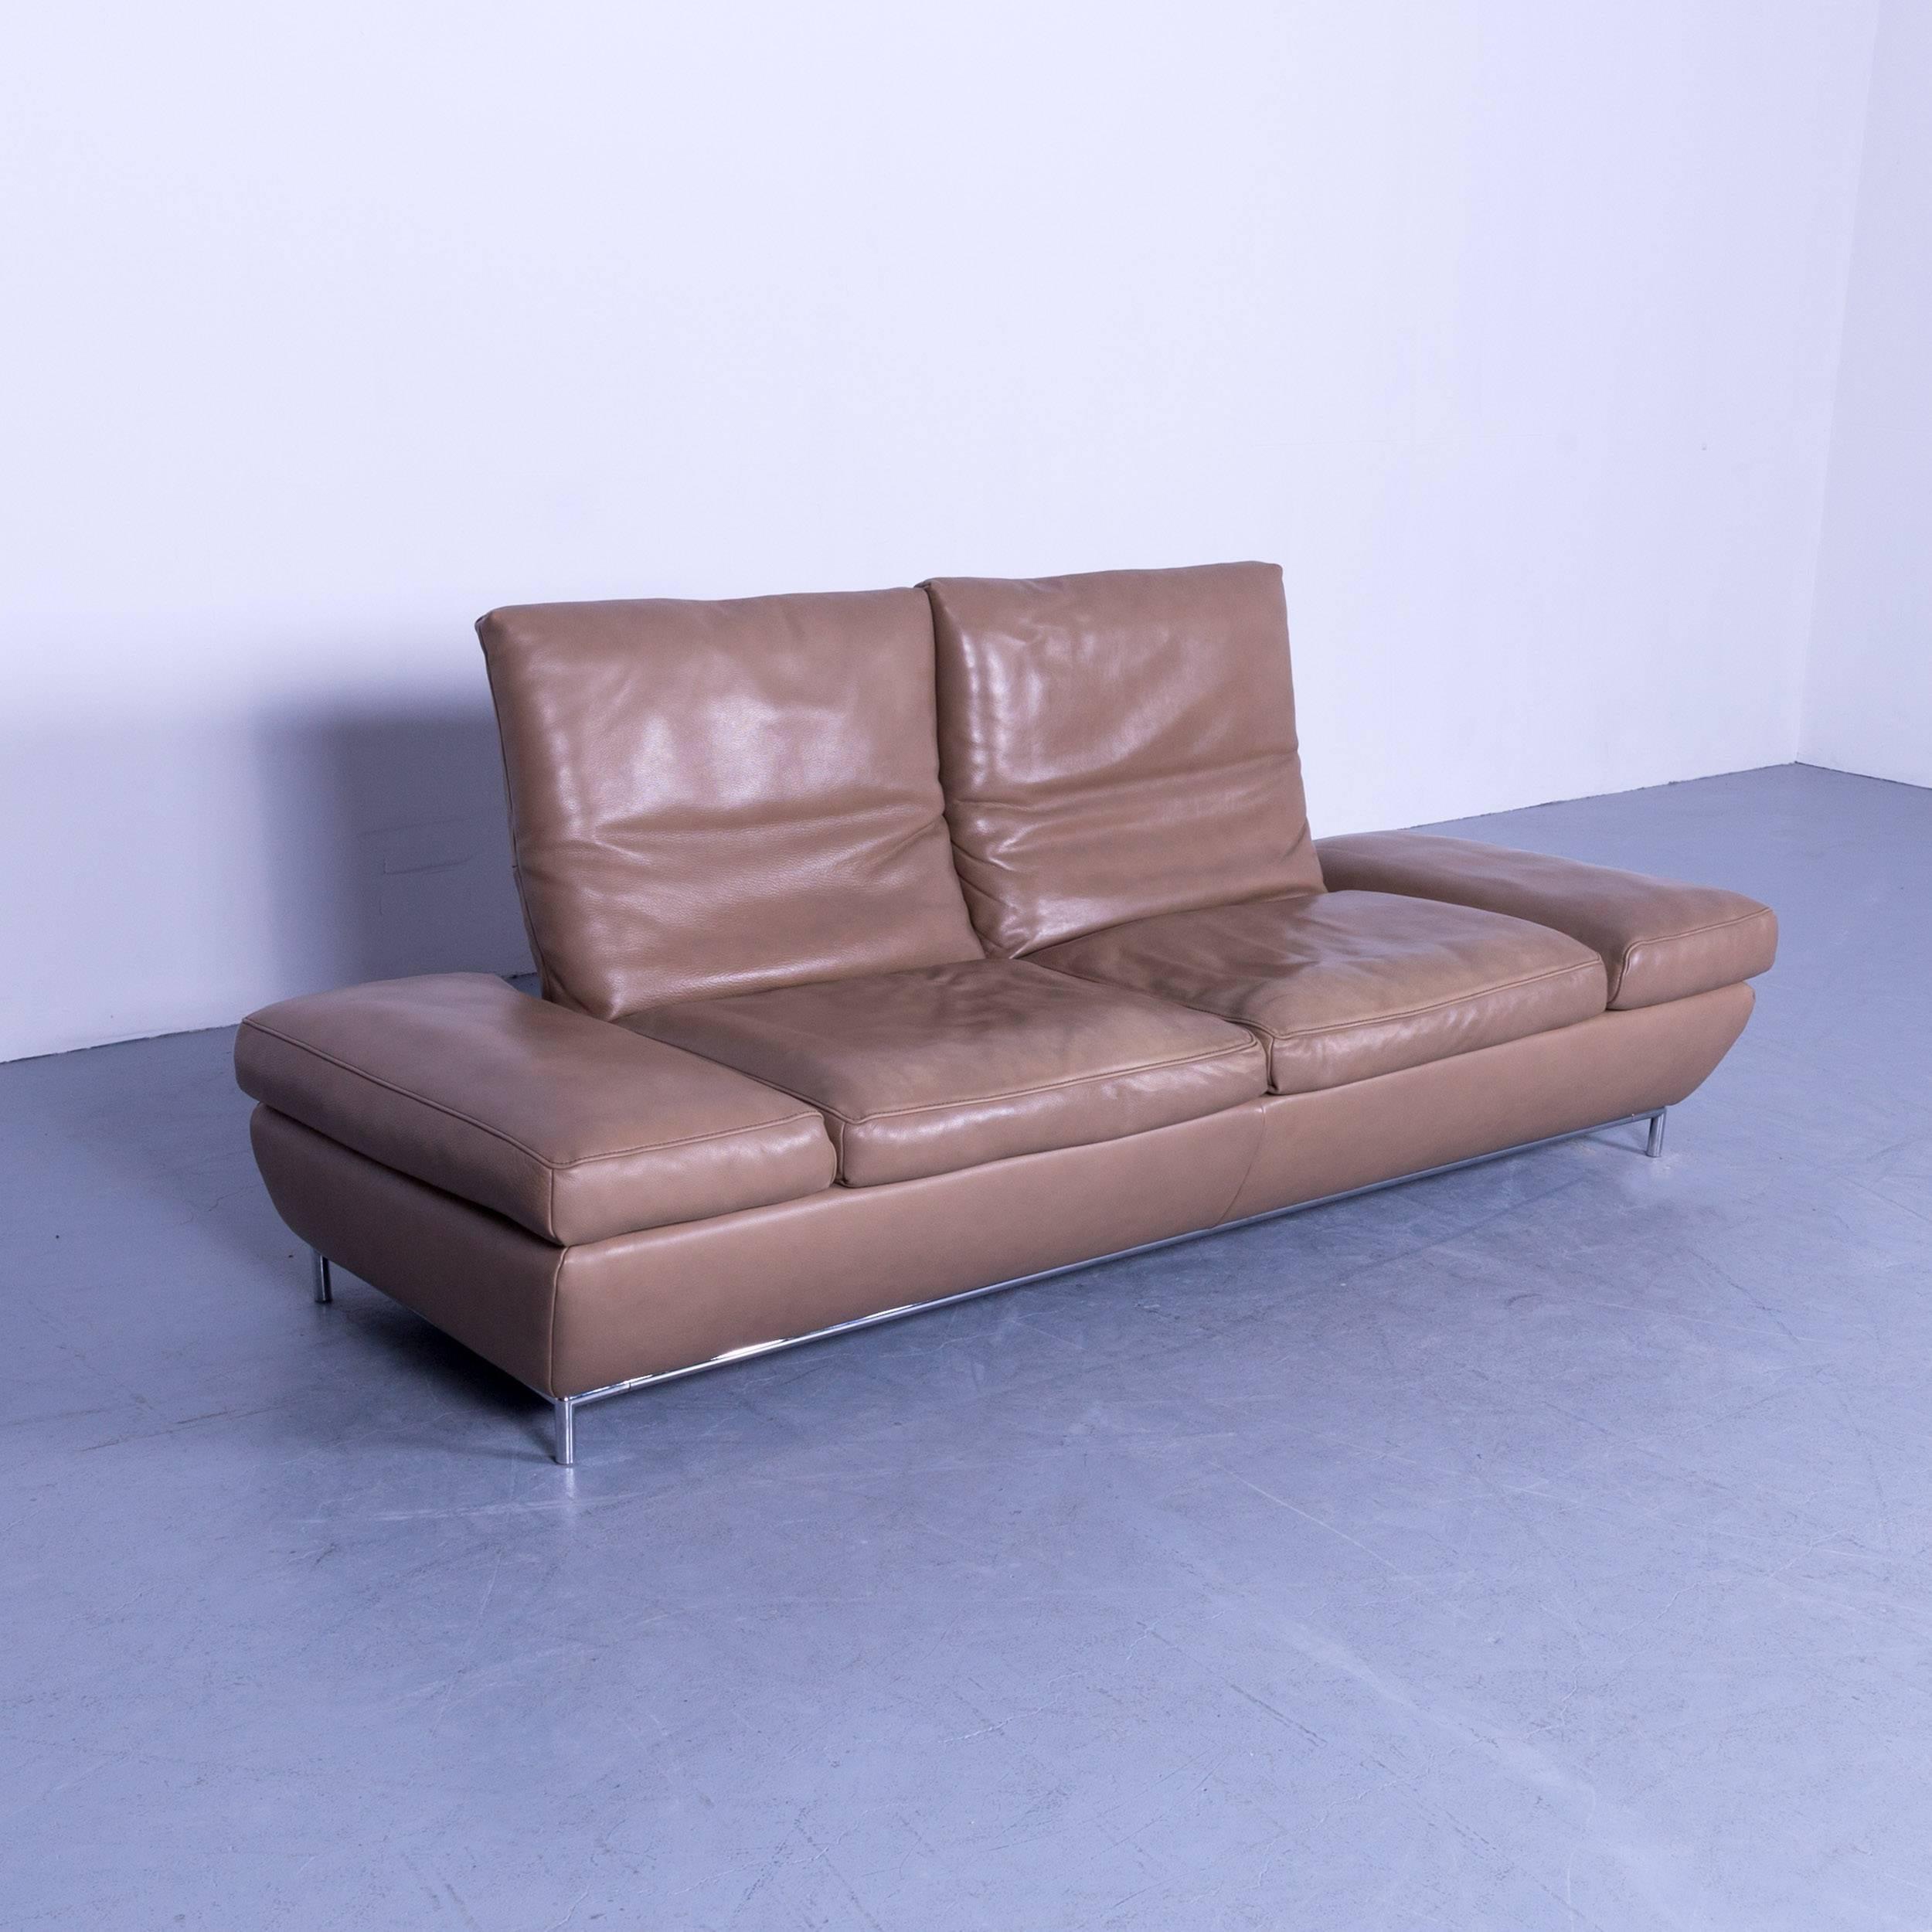 German Koinor Designer Three Seat Sofa In Light Brown Semi Anilin Leather  Function For Sale